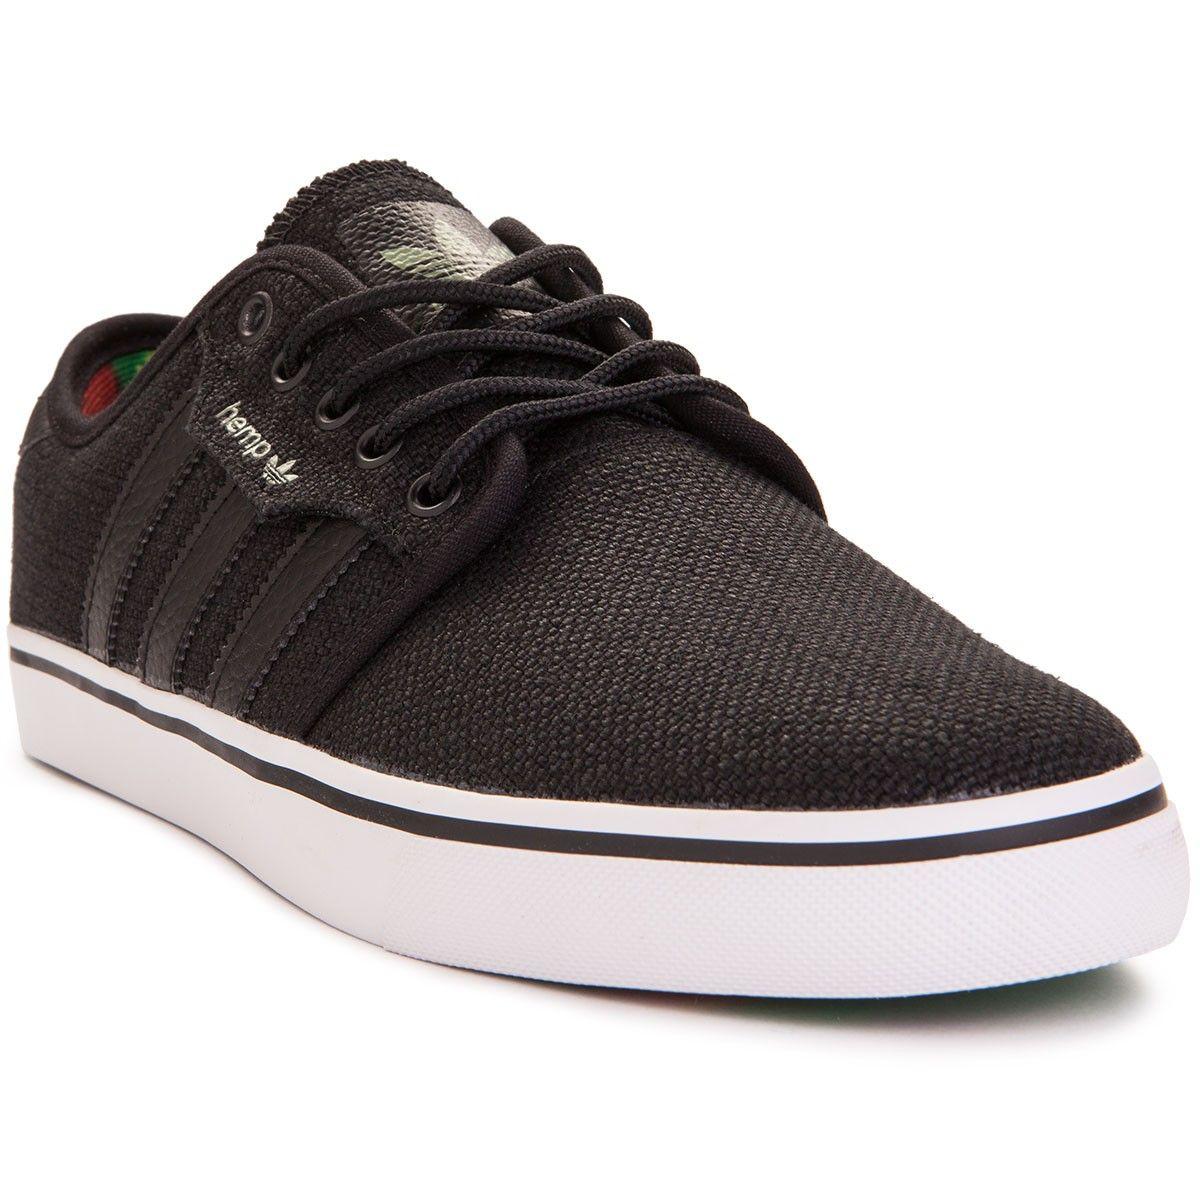 Adidas Seeley Hemp Shoes | Shoes, Black